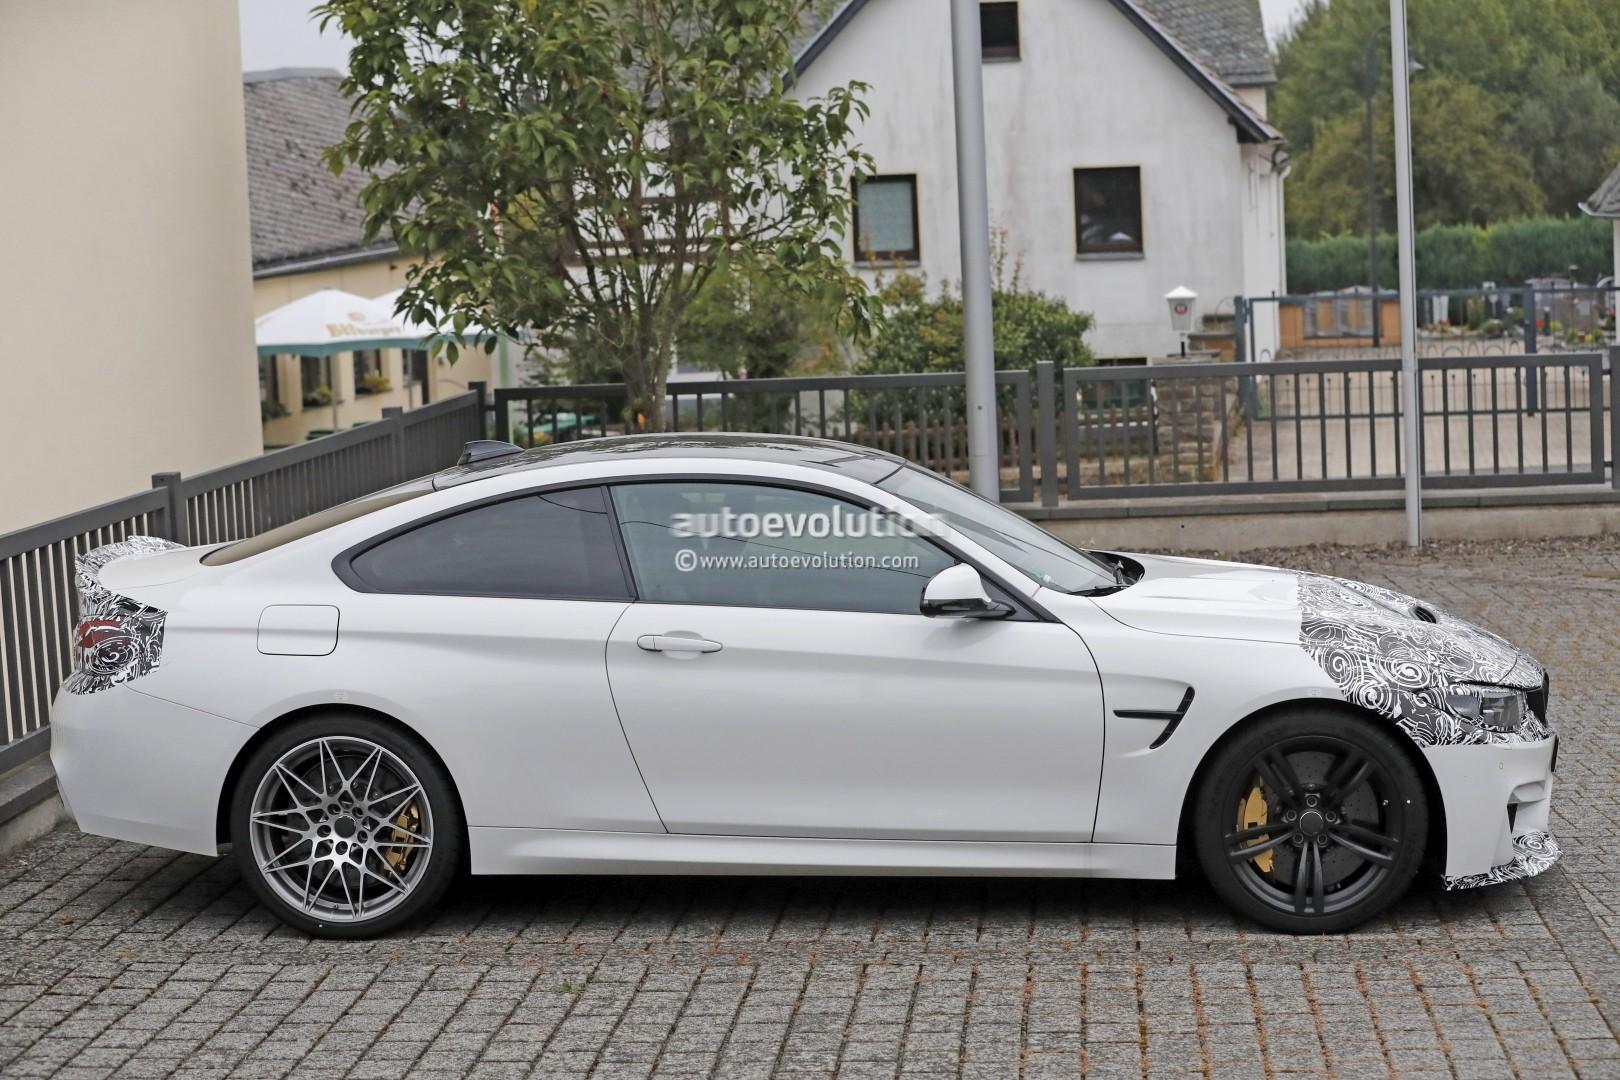 2014 - [BMW] M3 & M4 [F80/F82/F83] - Page 24 2018-bmw-m4-facelift-cs-special-edition-spied-shows-aggressive-aerodynamics_7